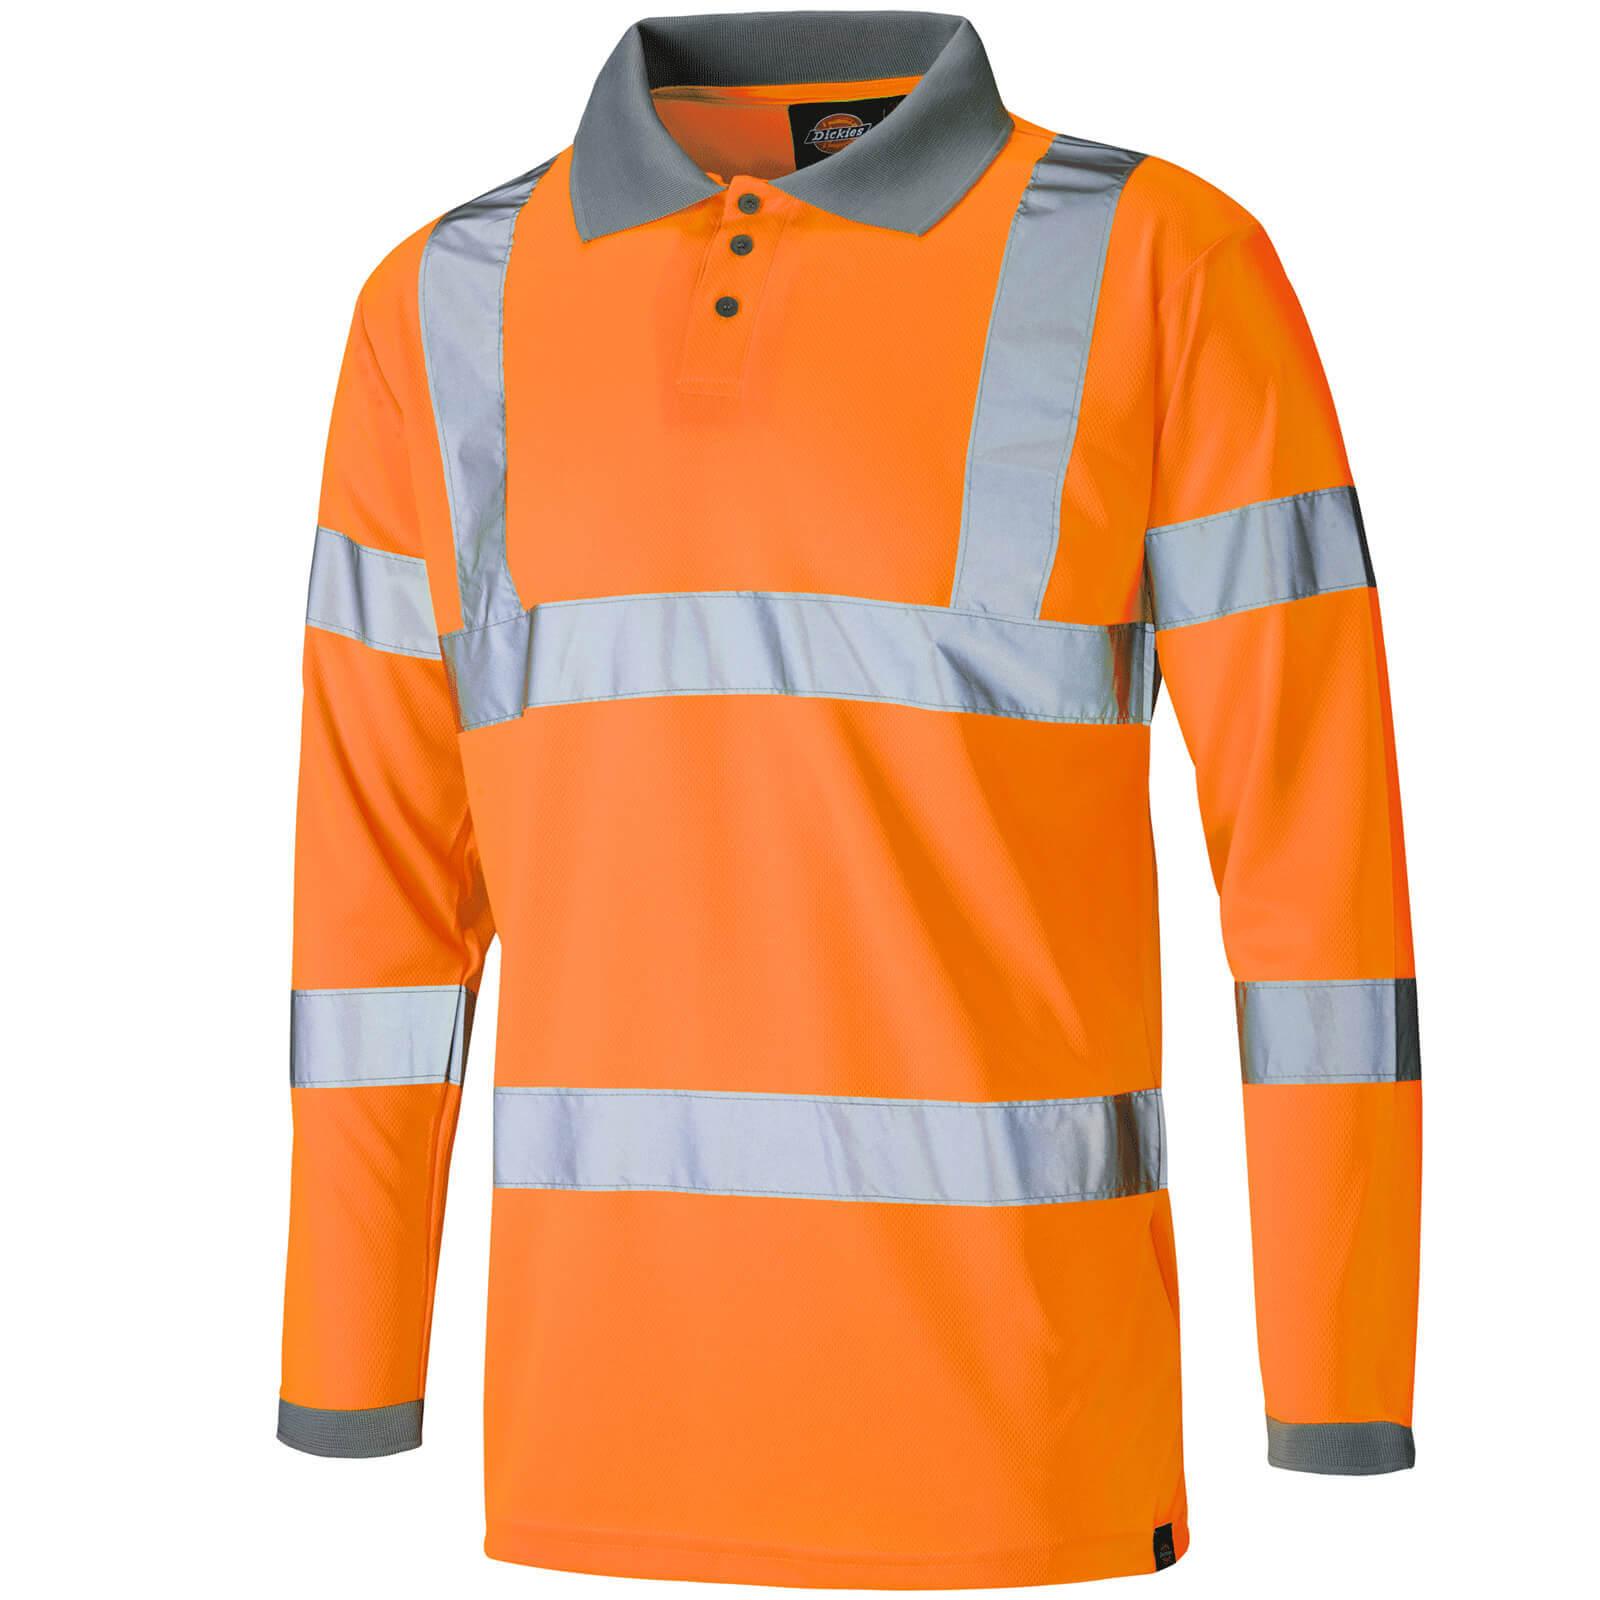 Image of Dickies Mens High Visibility Long Sleeve Polo Shirt Orange 2XL